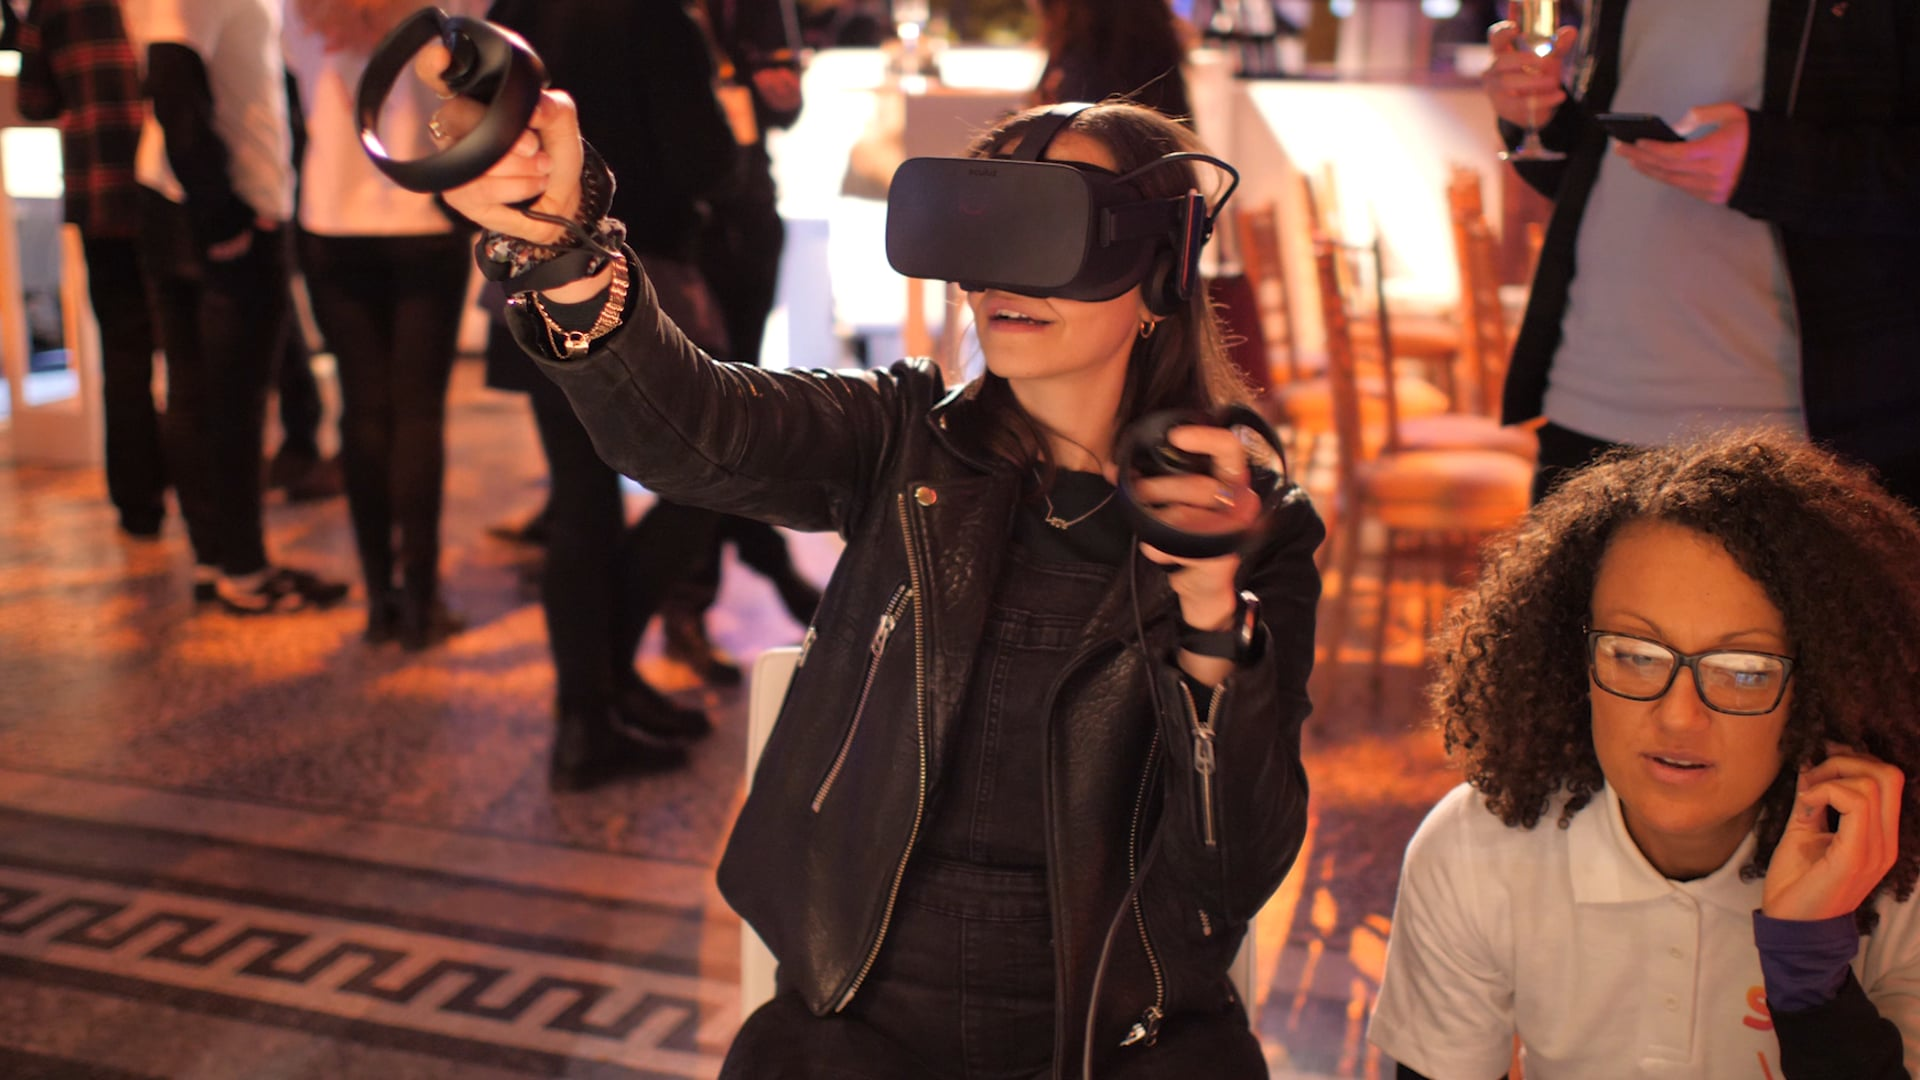 Presentación Sky VR - Hold The World Launch | Event Concept Ltd. | UK